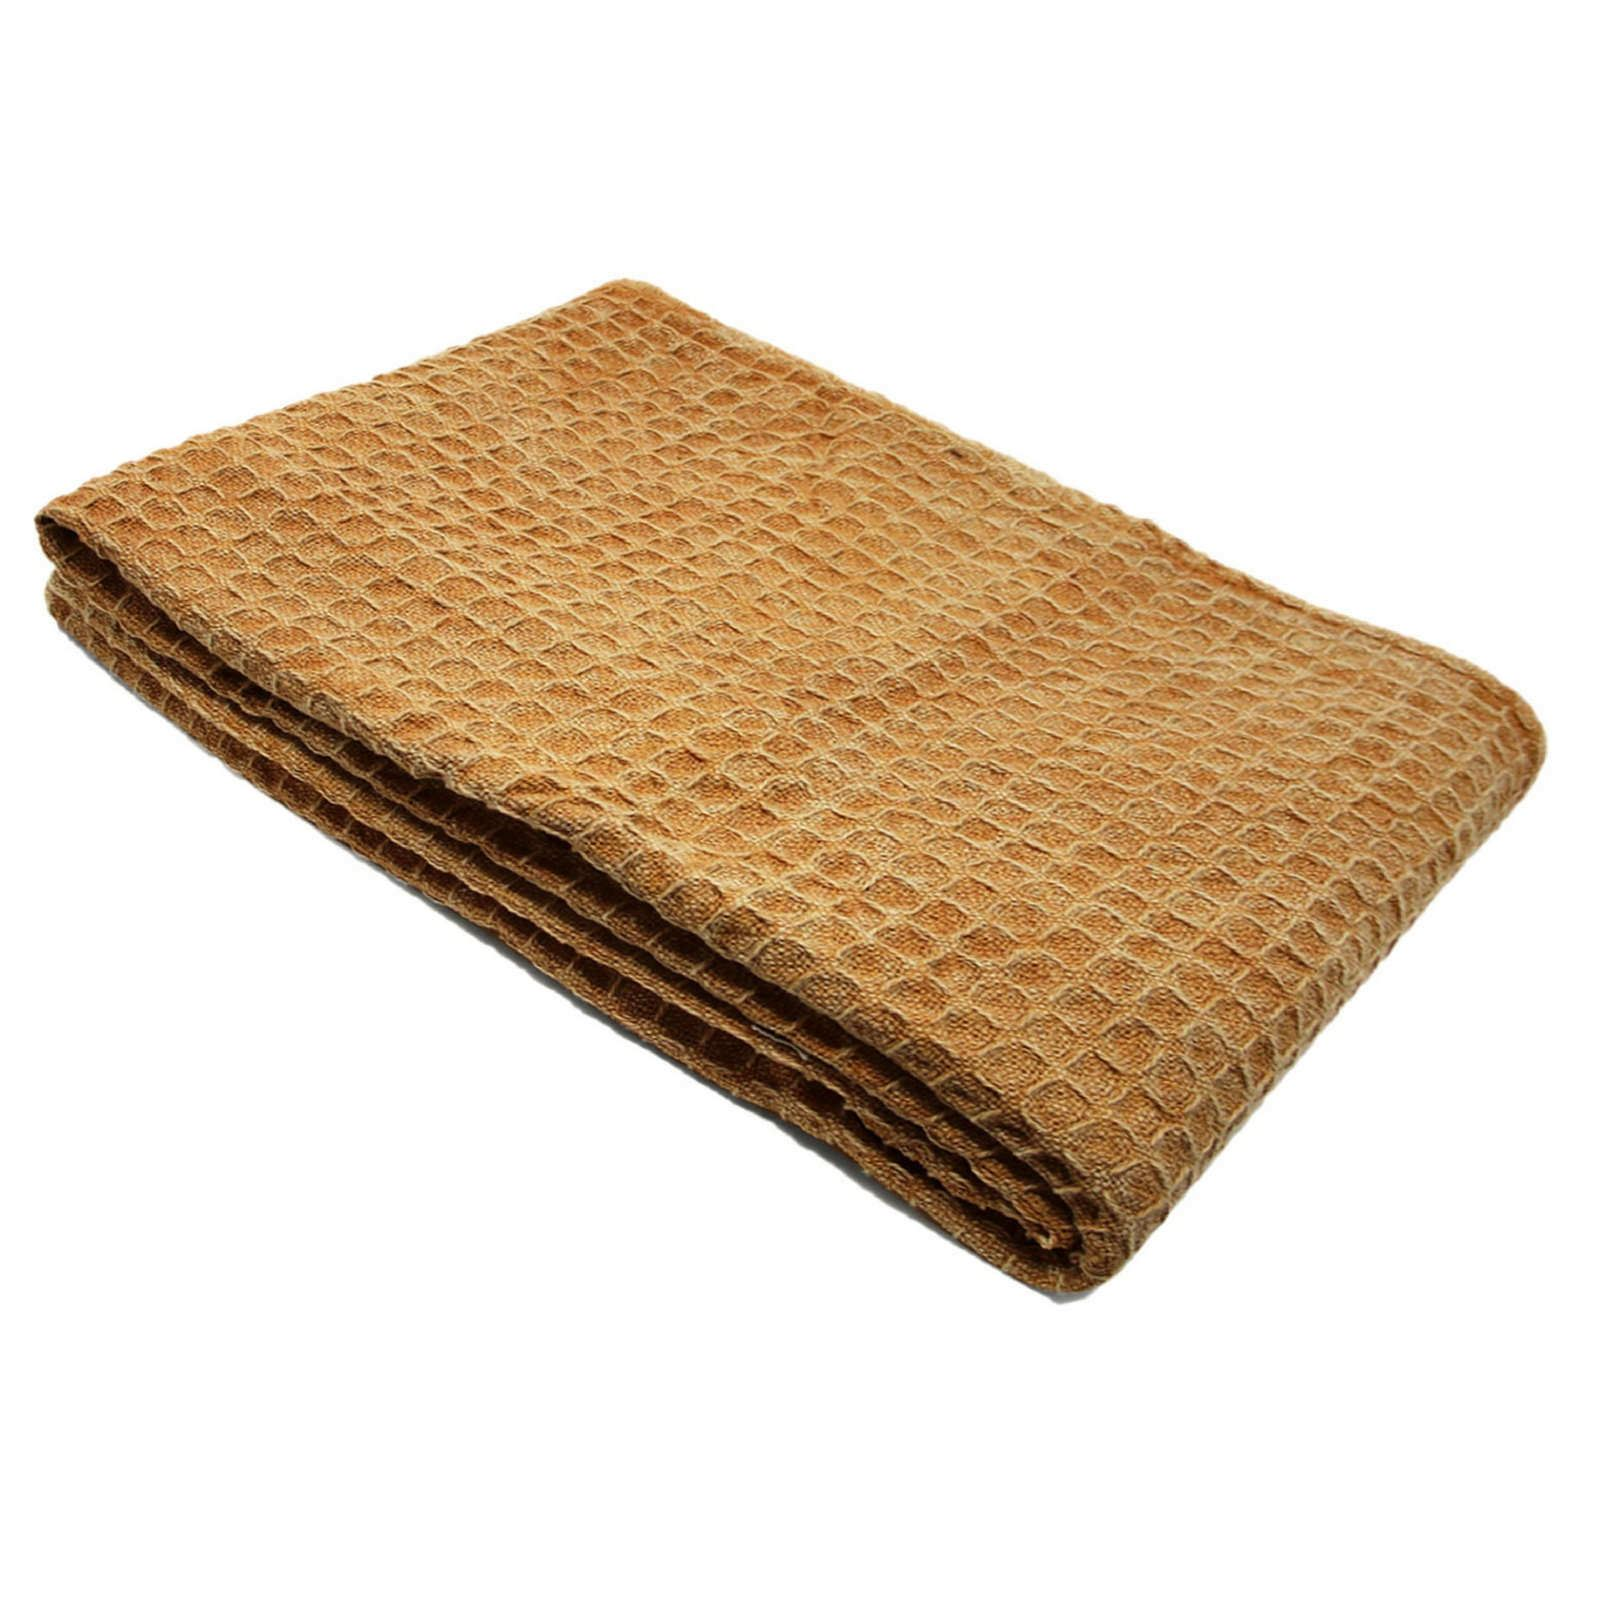 Oregon-Stonewash-Waffle-Throw-Modern-Distressed-Sofa-Bed-Blankets-100-Cotton thumbnail 21